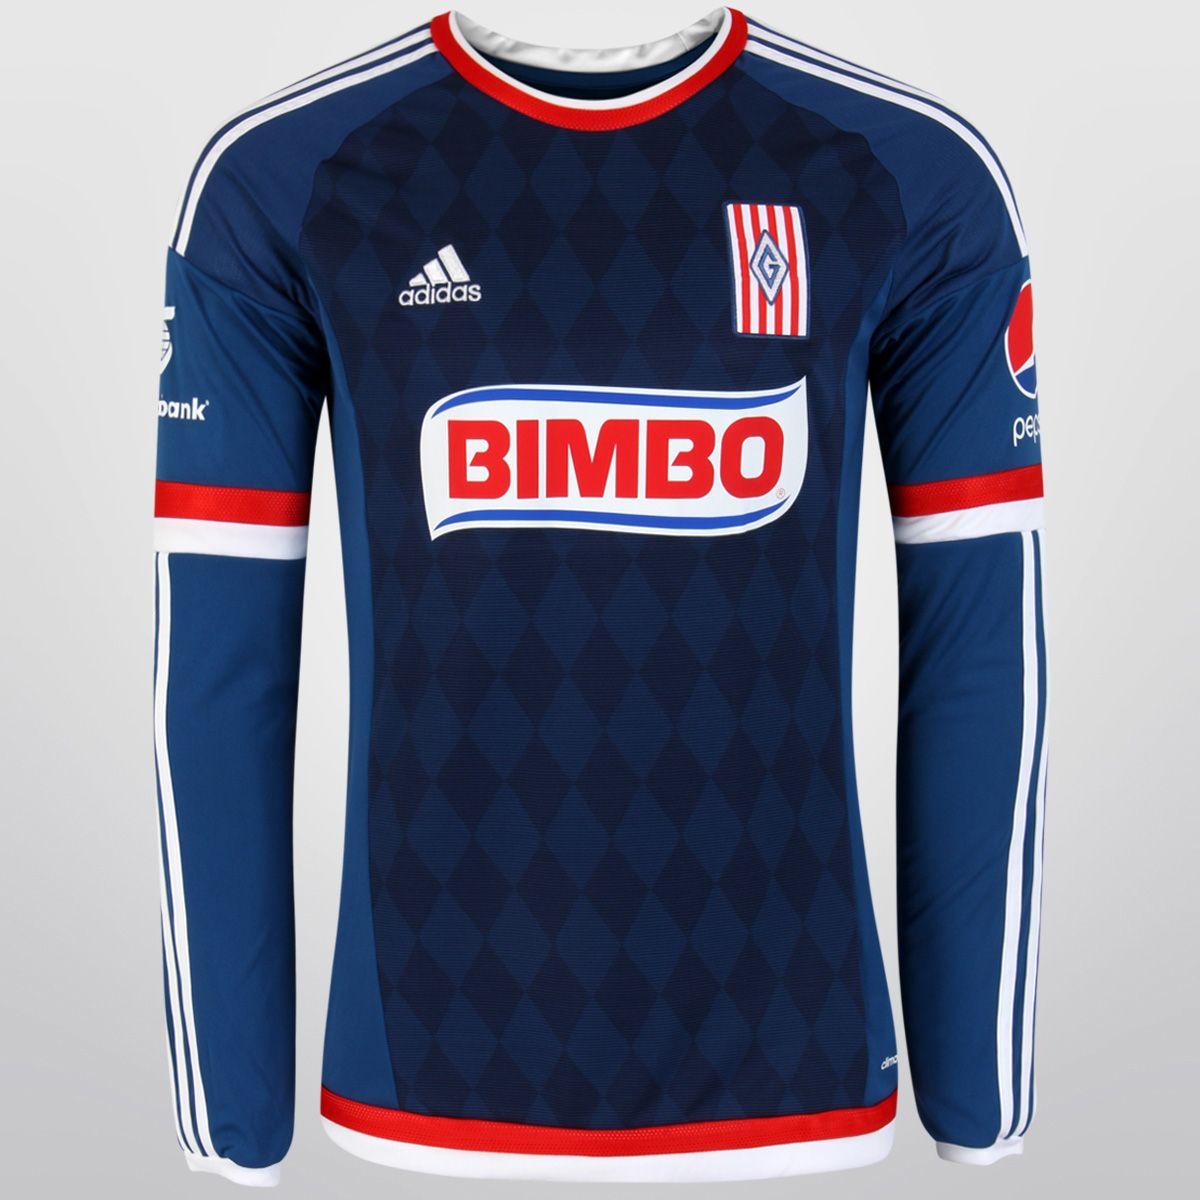 Guadalajara Chivas Jersey 2015 16 Away Blue LS Soccer Shirt  0181c2c6c